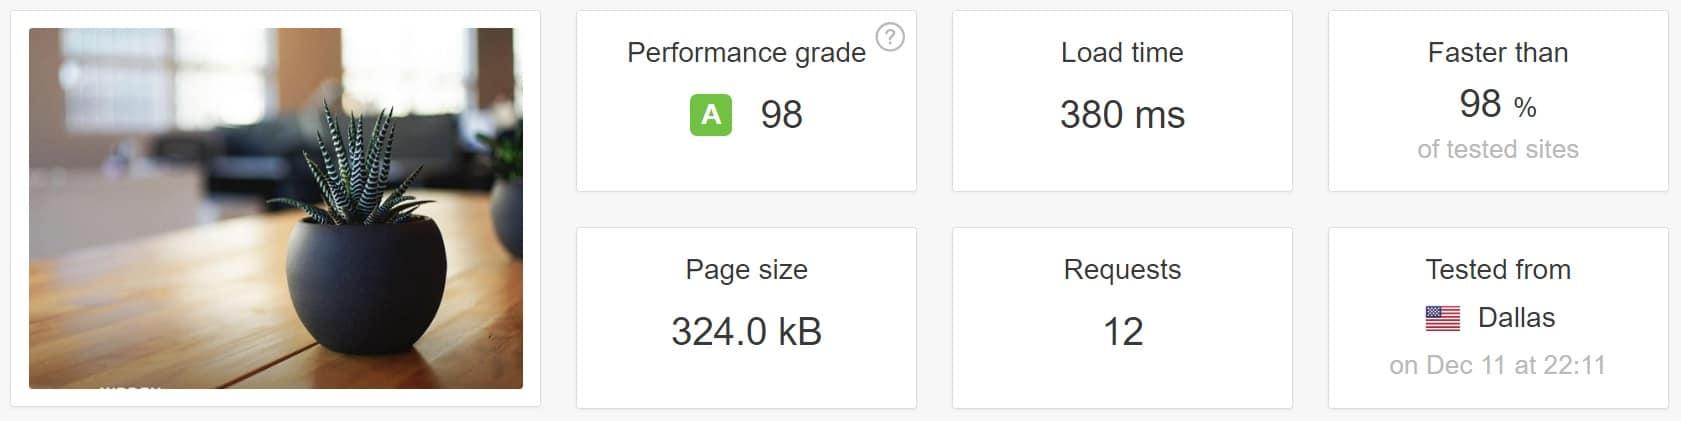 PageSpeed Insightsに沿った最適化の後のスピードテスト